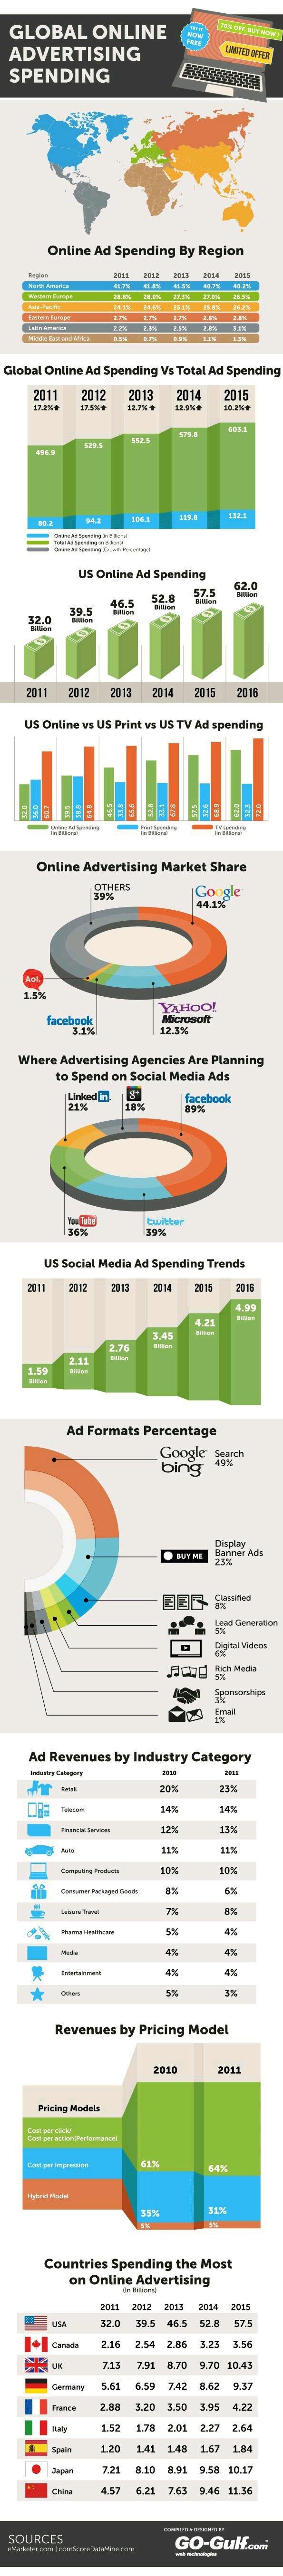 Global Online Advertising Spending #Infographic